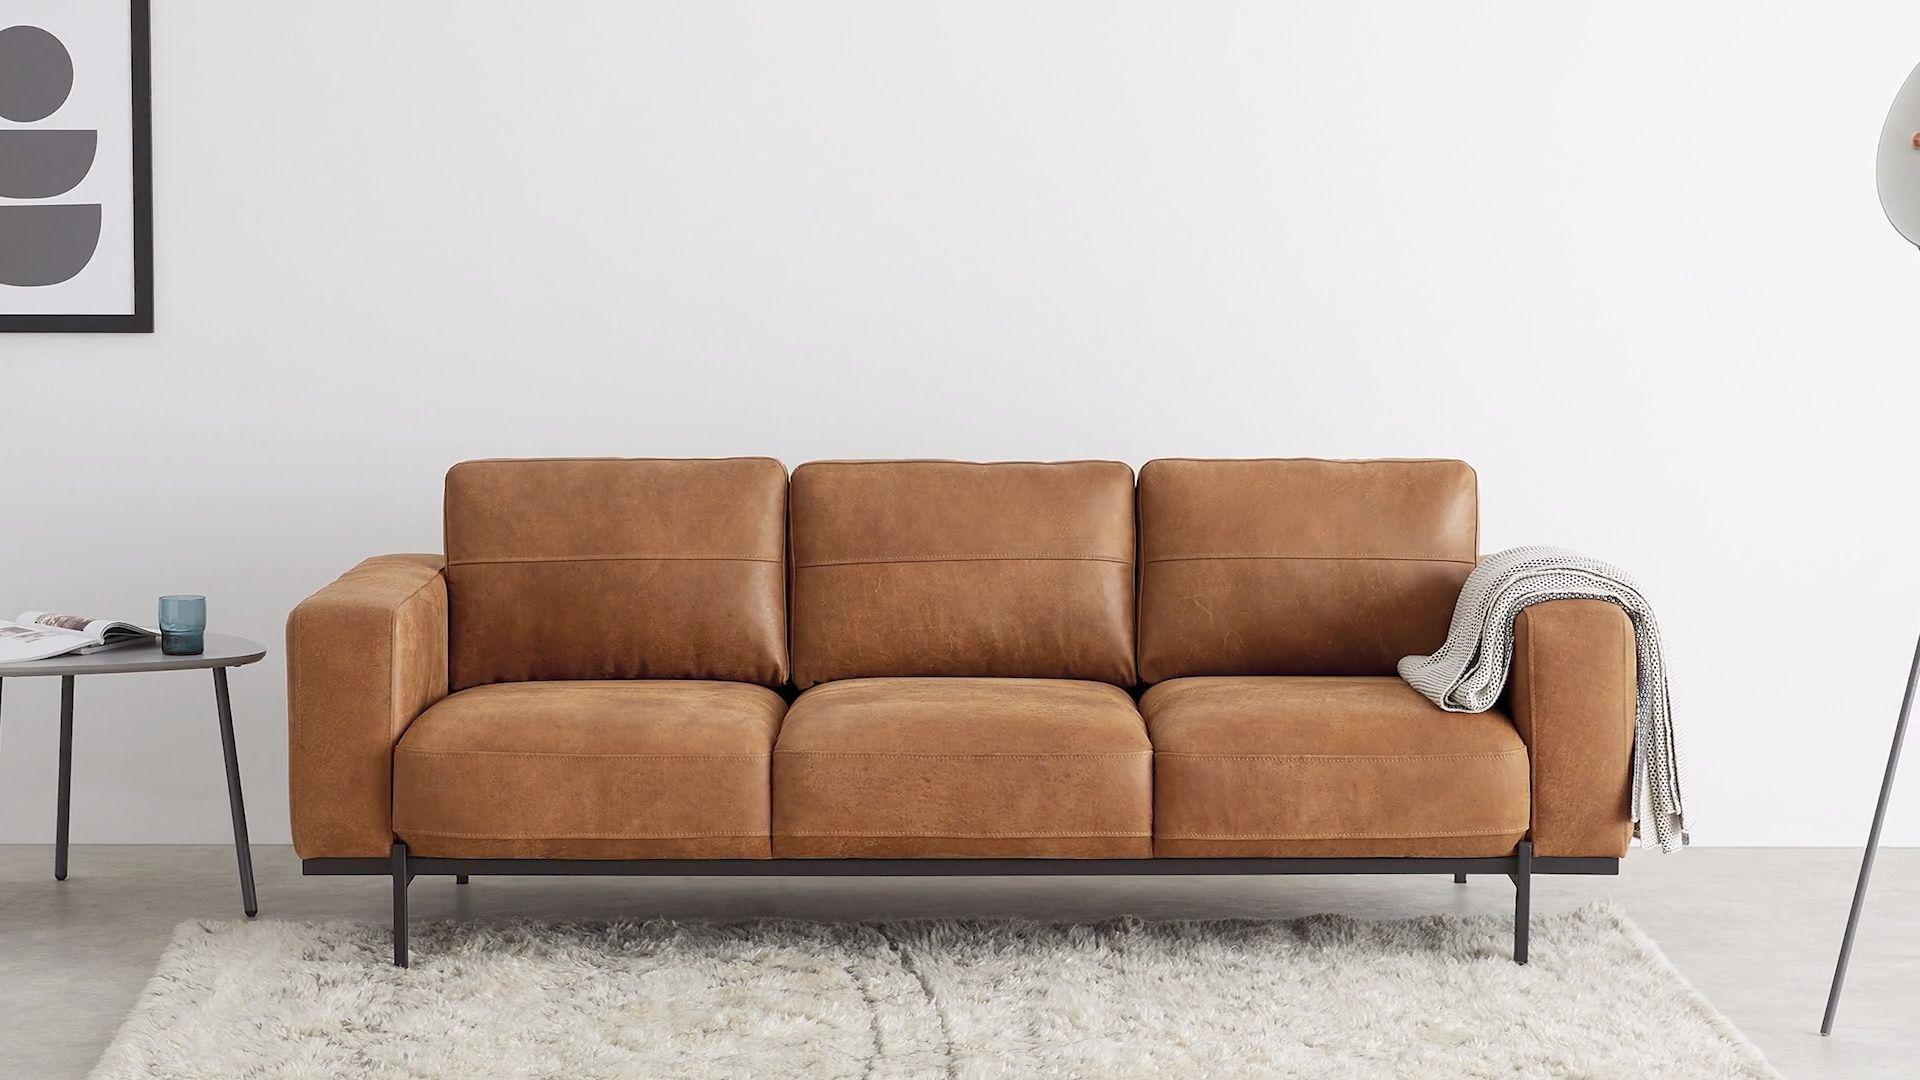 Jarrod 3 Sitzer Sofa Leder In Cognac Made Com In 2020 3 Sitzer Sofa Sofa Sessel